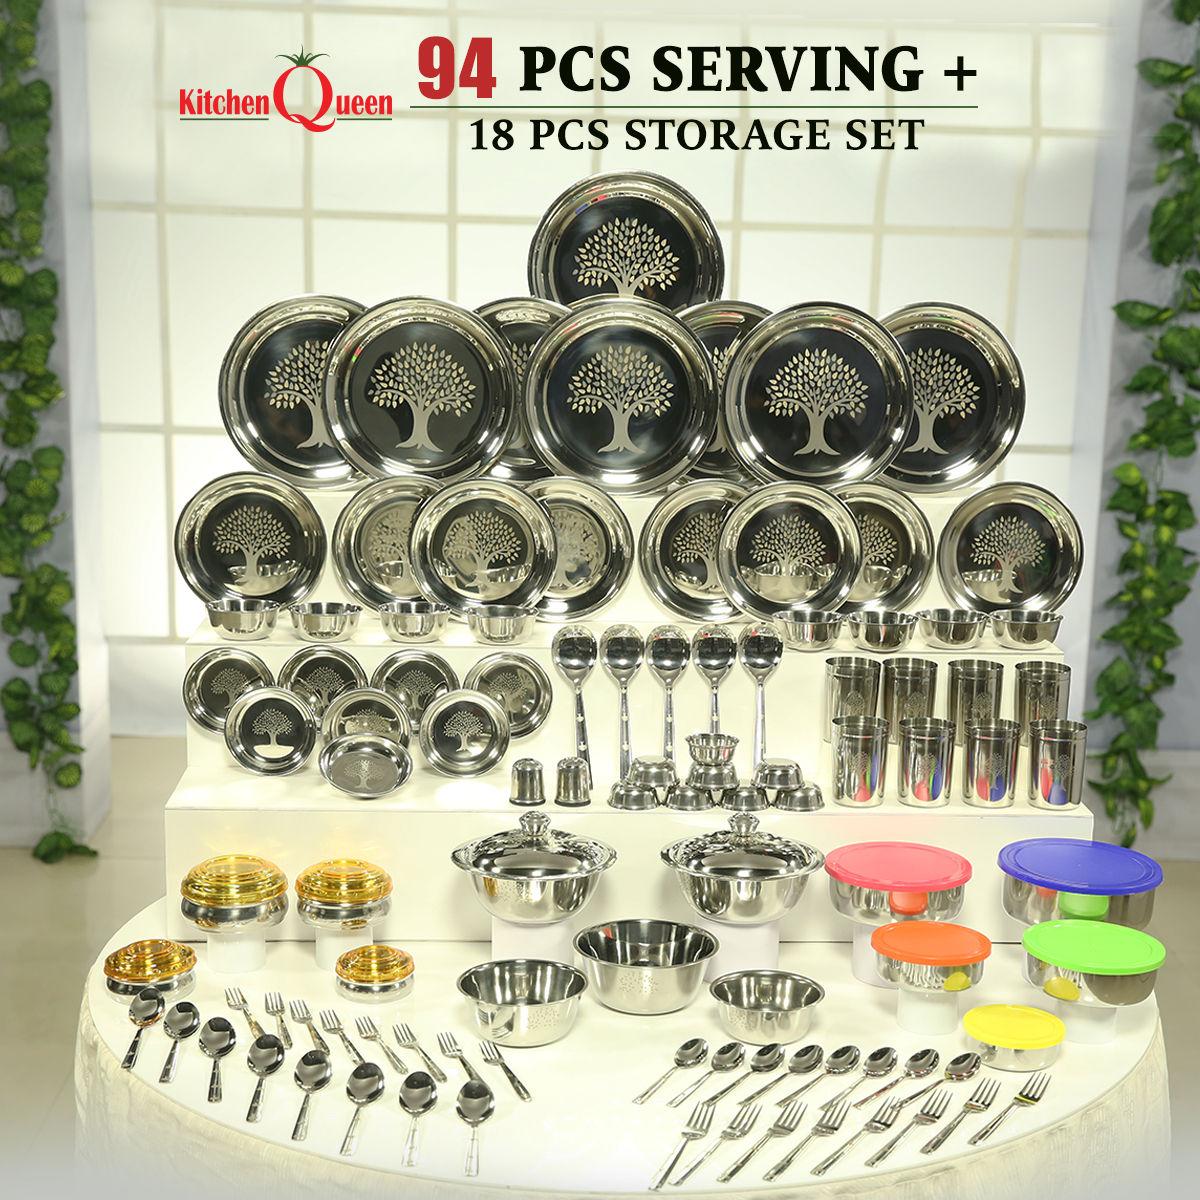 Buy 94 Pcs Serving 18 Pcs Storage Set Online At Best Price In India On Naaptol Com